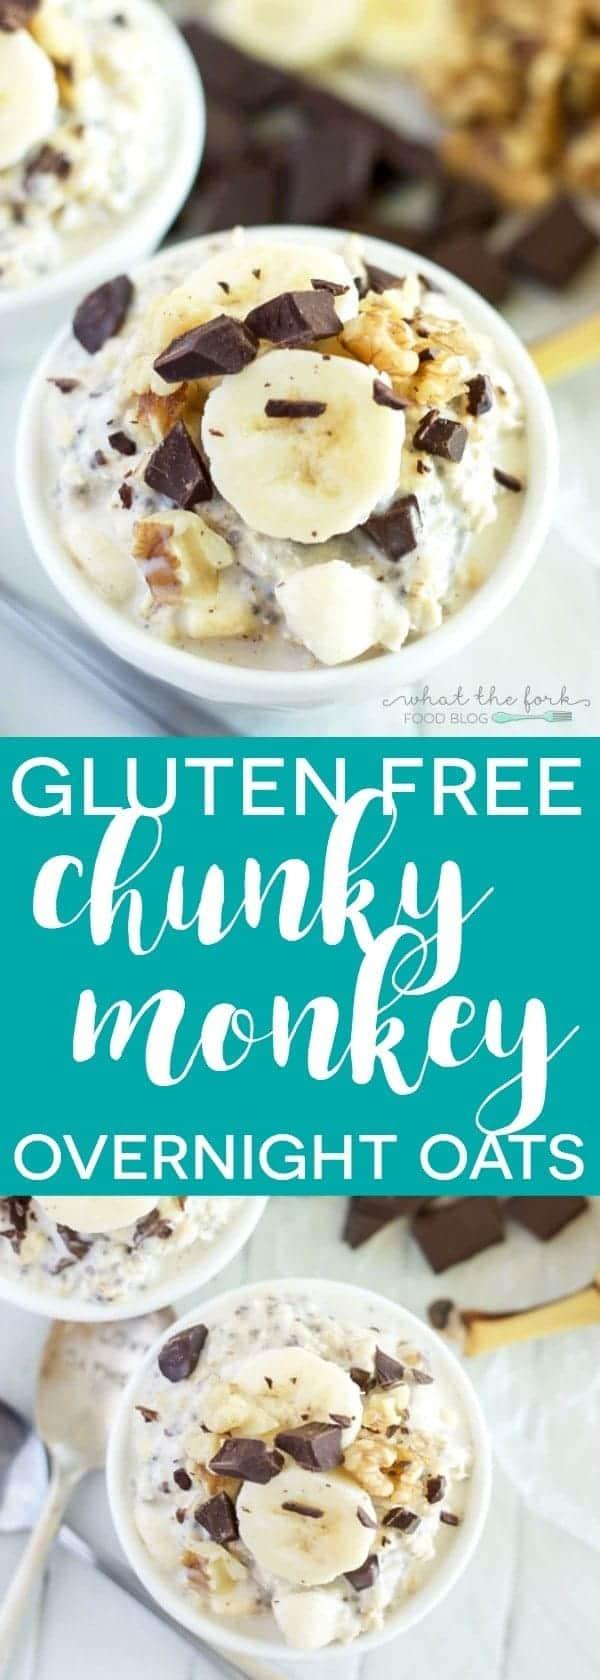 Gluten Free Chunky Monkey Overnight Oats from @whattheforkblog | whattheforkfoodblog